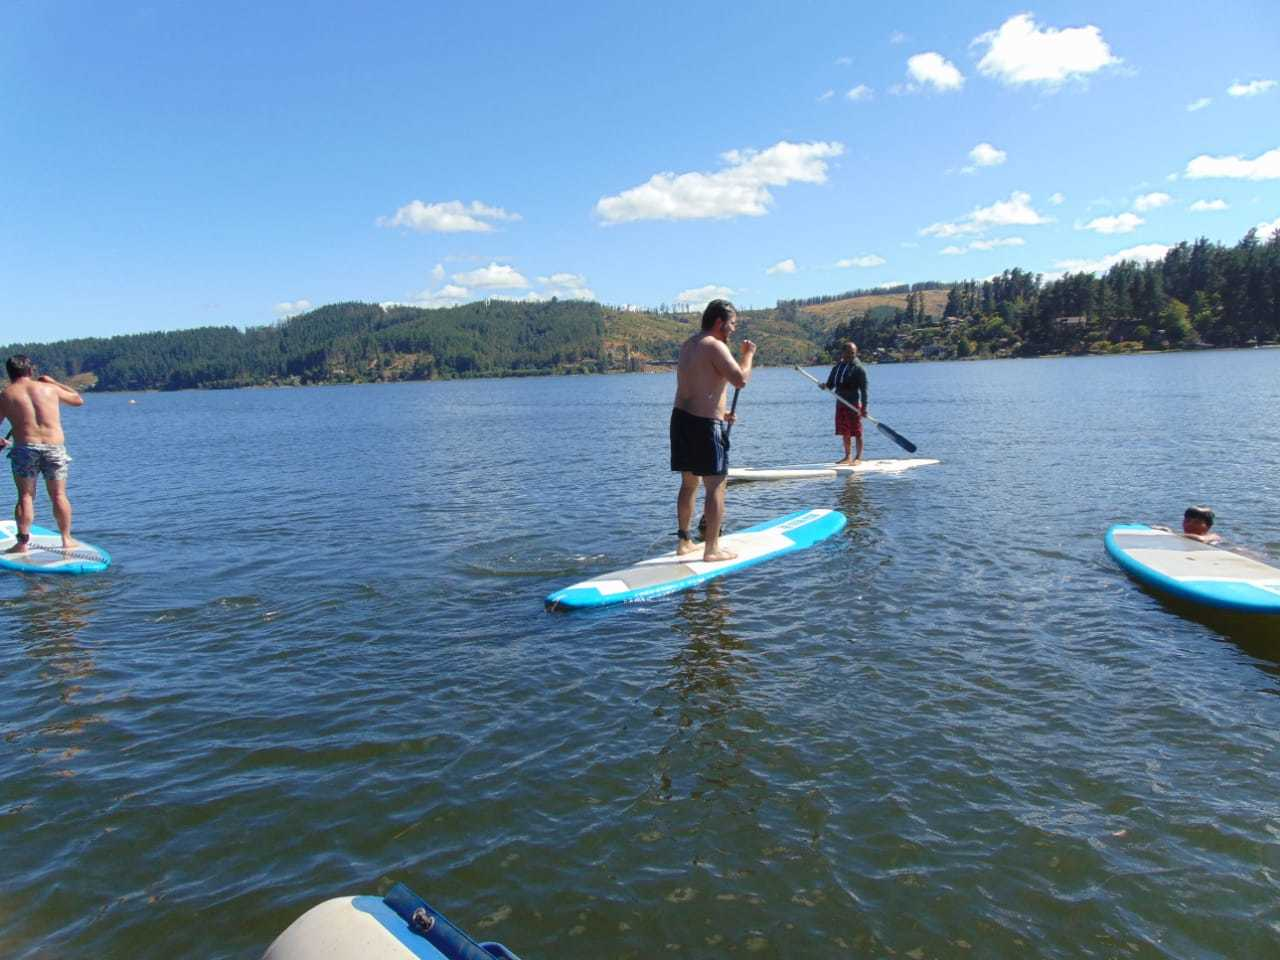 Arriendo Día de Stand-Up Paddle (SUP) en Vichuquén